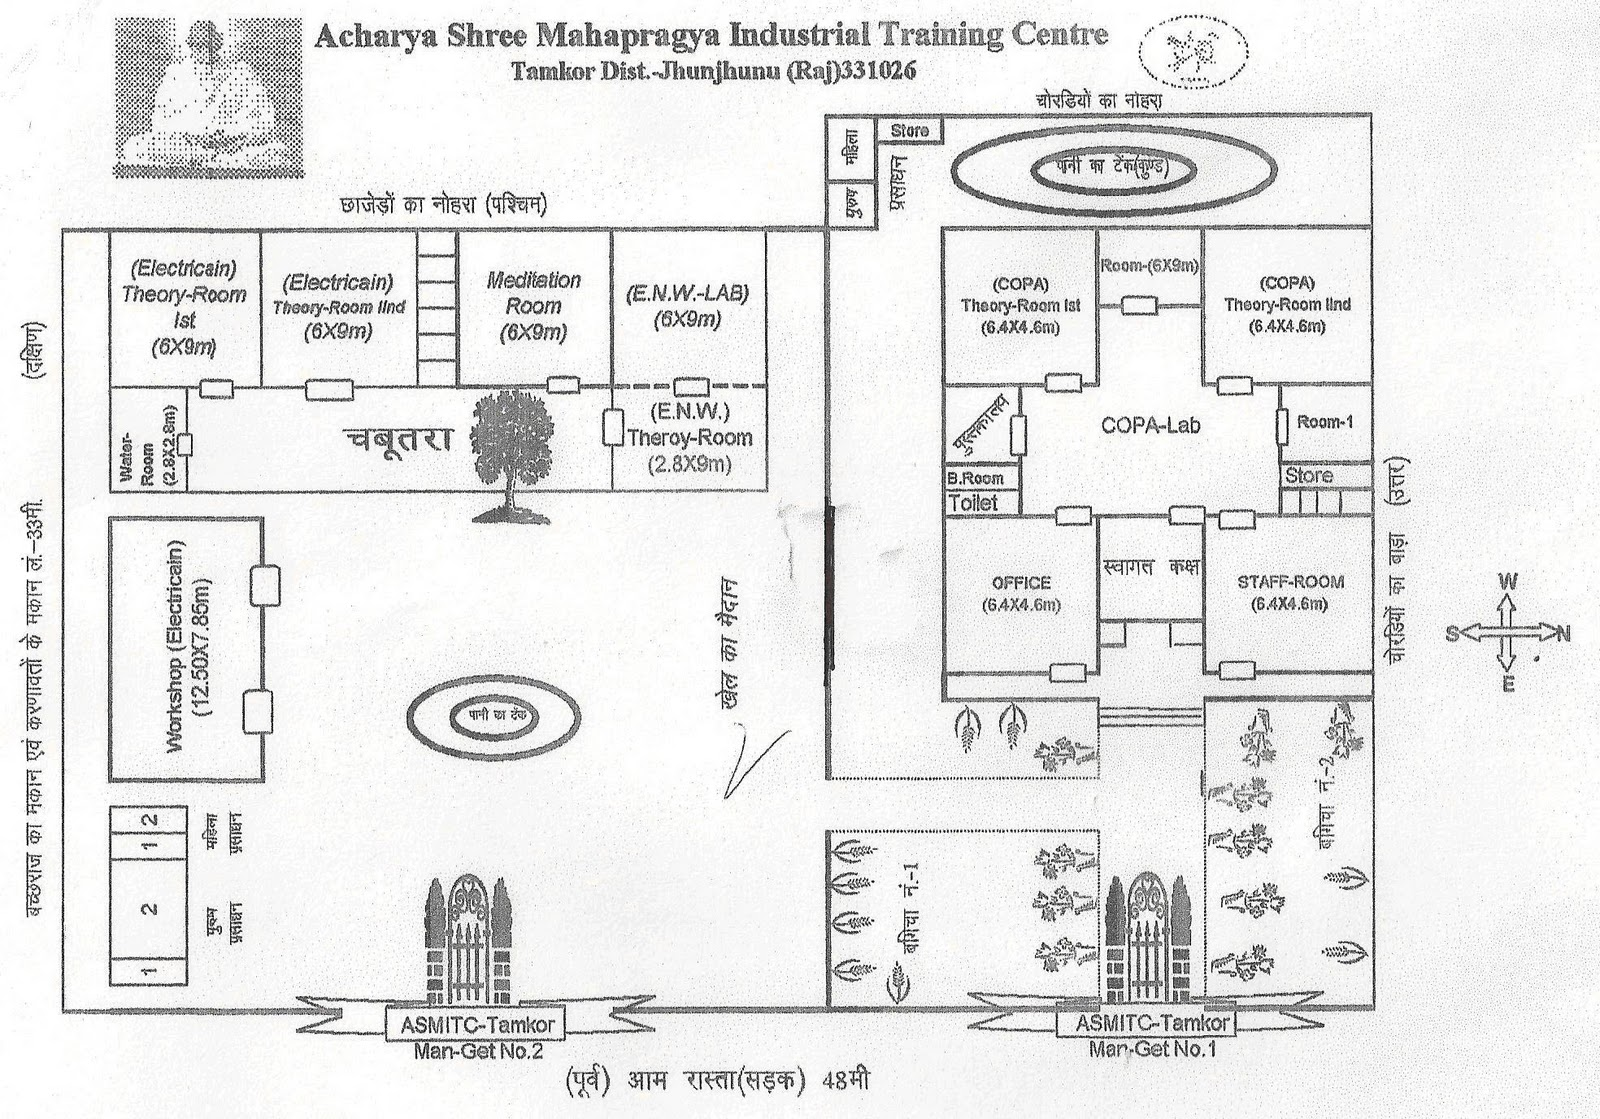 Acharya Shri Mahapragya Industrial Training Centre June